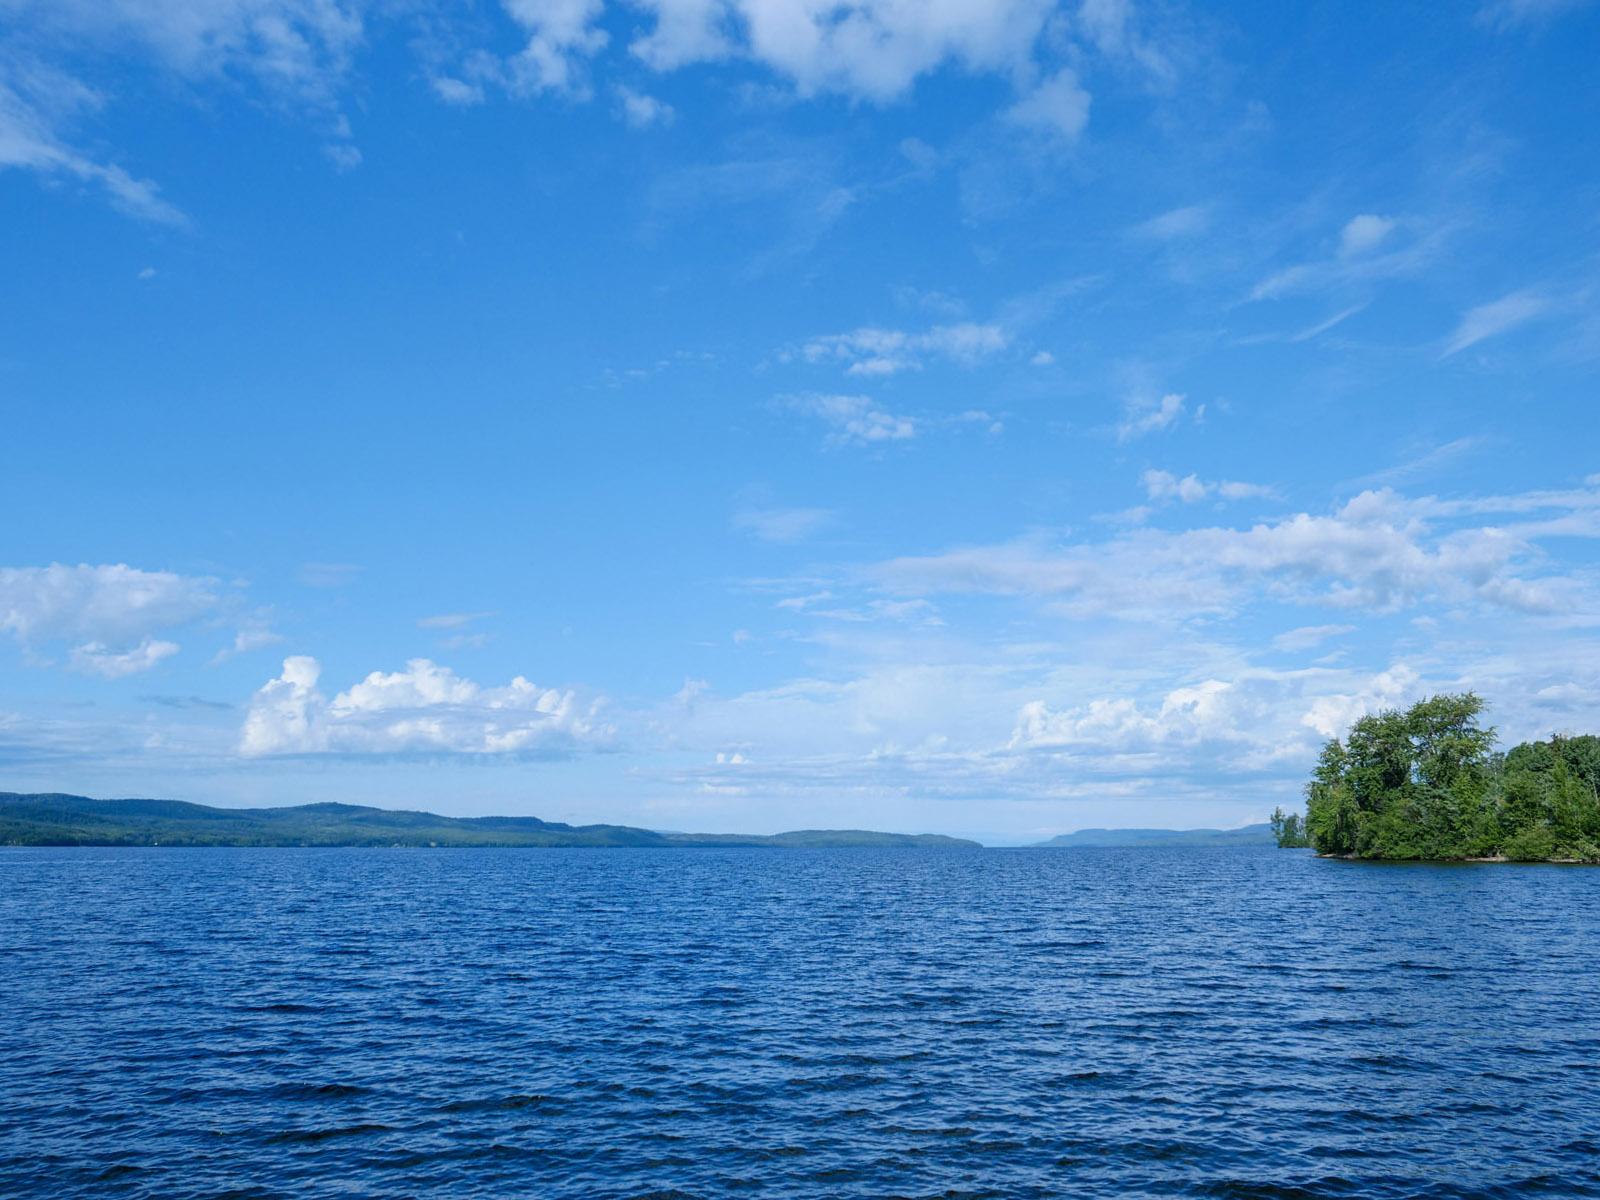 Wistaria farmland ootsa lake 06